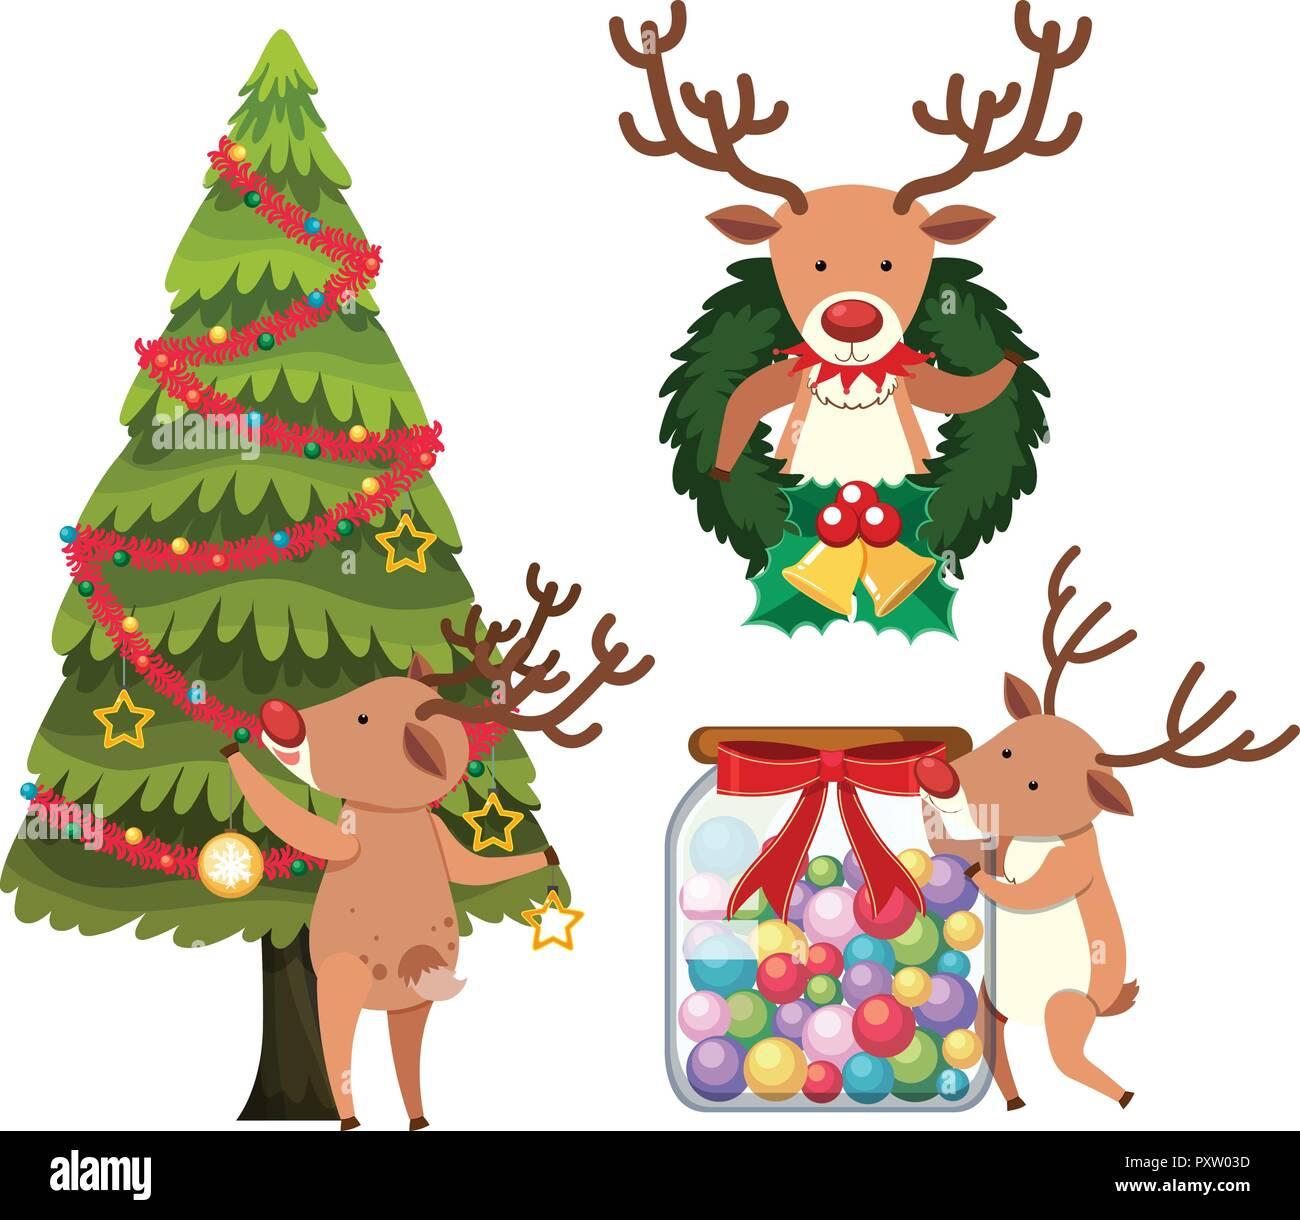 Reindeer decorating christmas tree illustration - Stock Vector